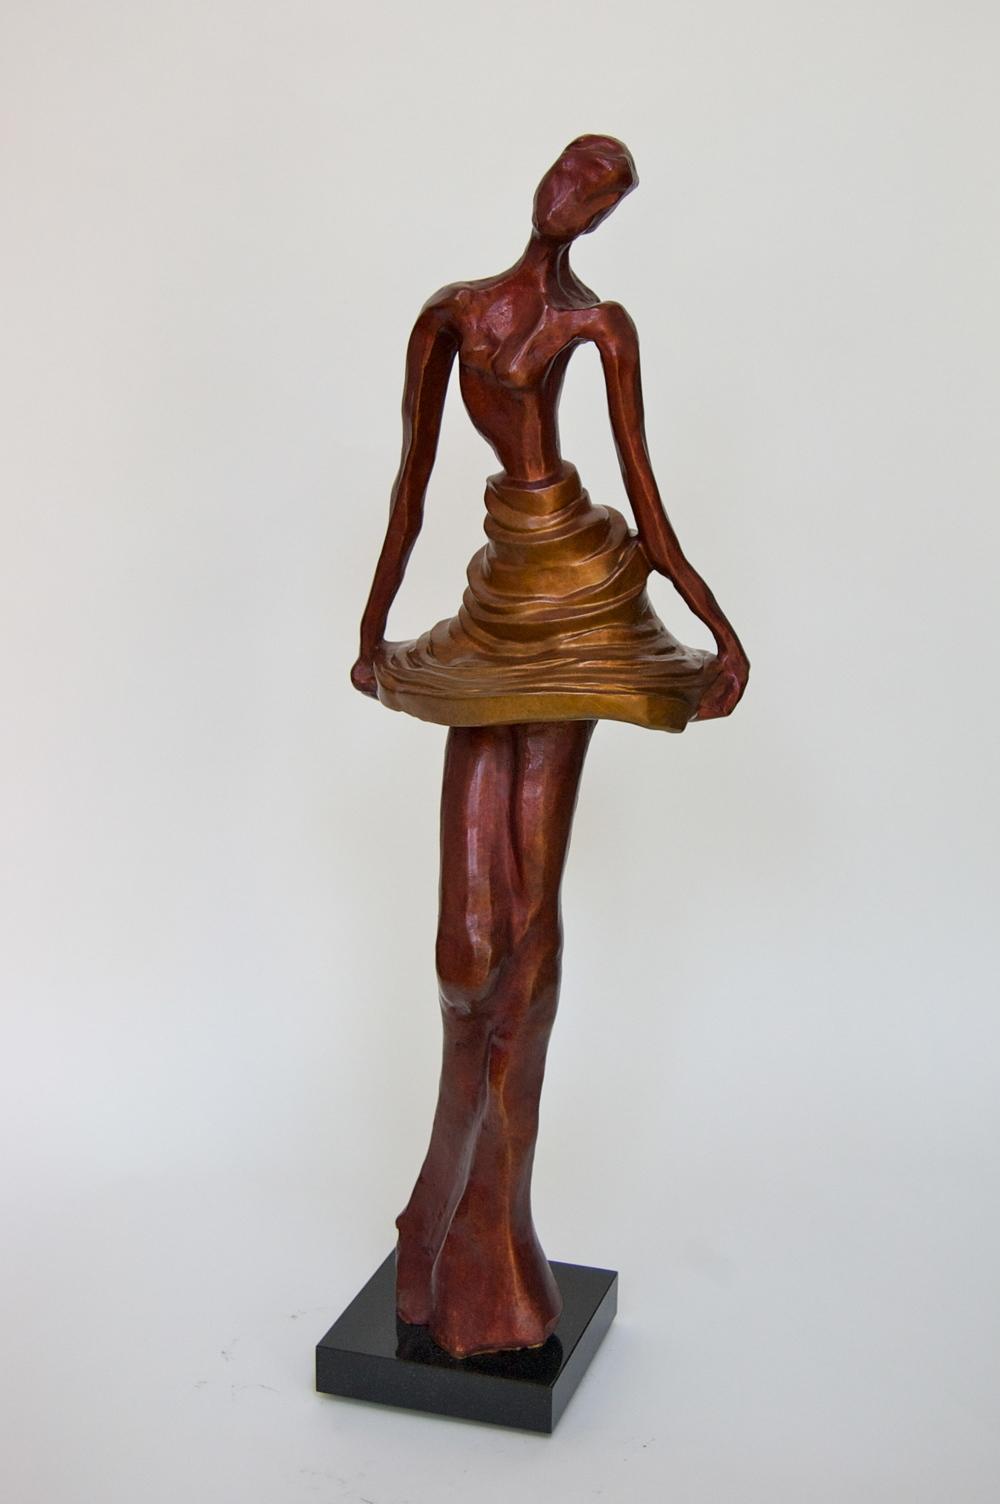 So Pretty! bronze by Fabienne Slama Bismuth